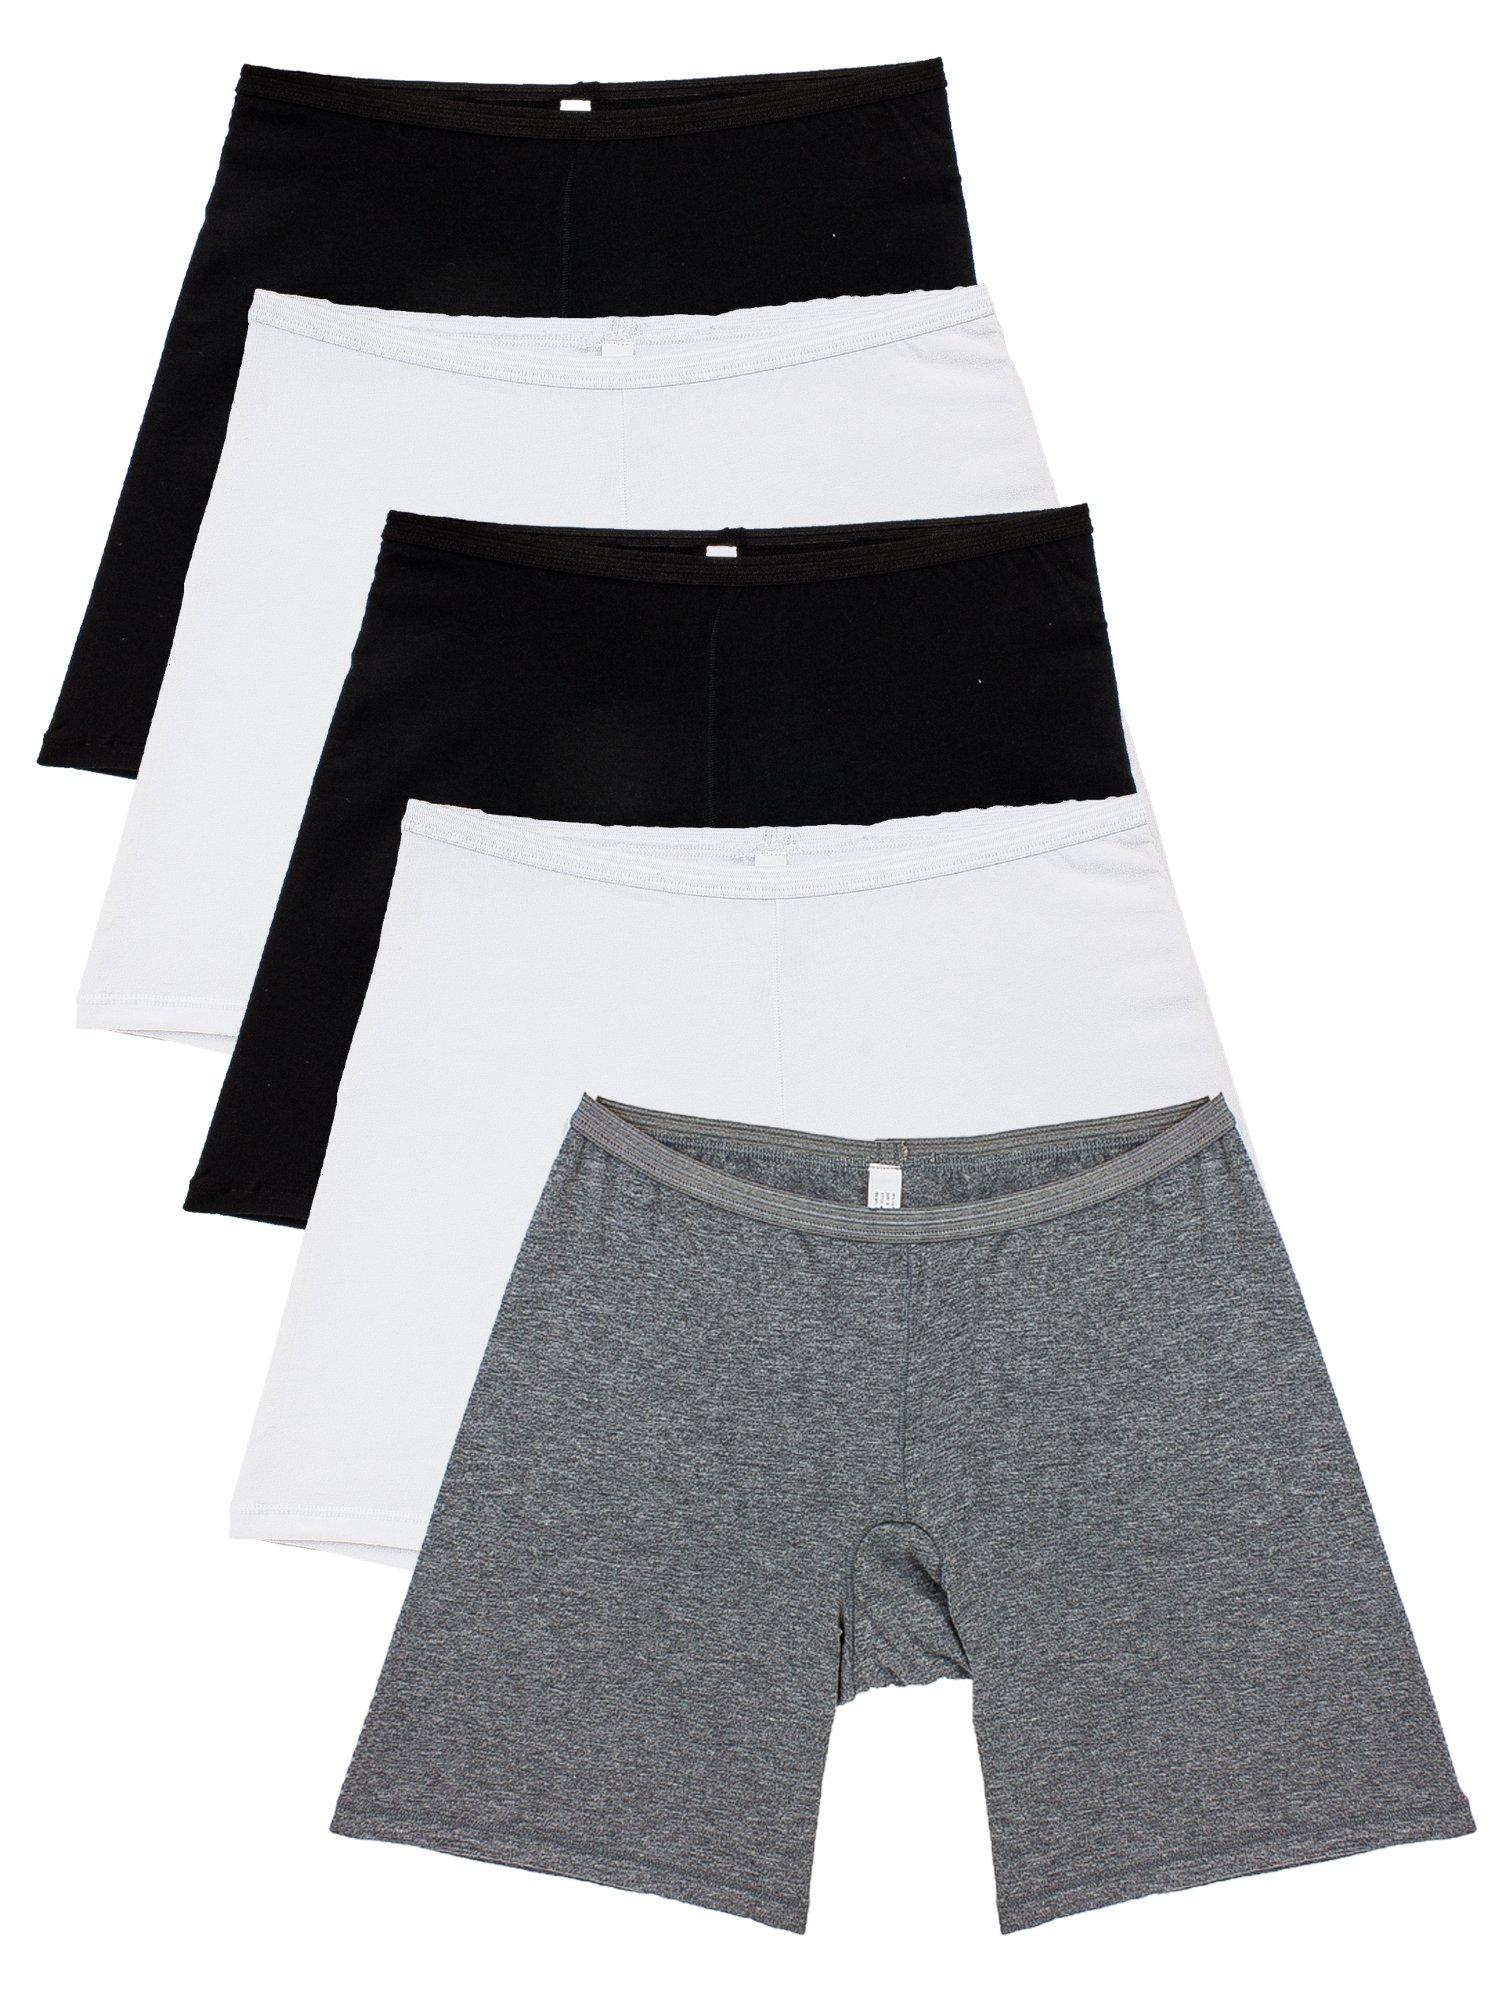 B2BODY 5 Pack Women's Regular Size Stretch Cotton Long Leg 6.5'' Boyshort Briefs(Small)